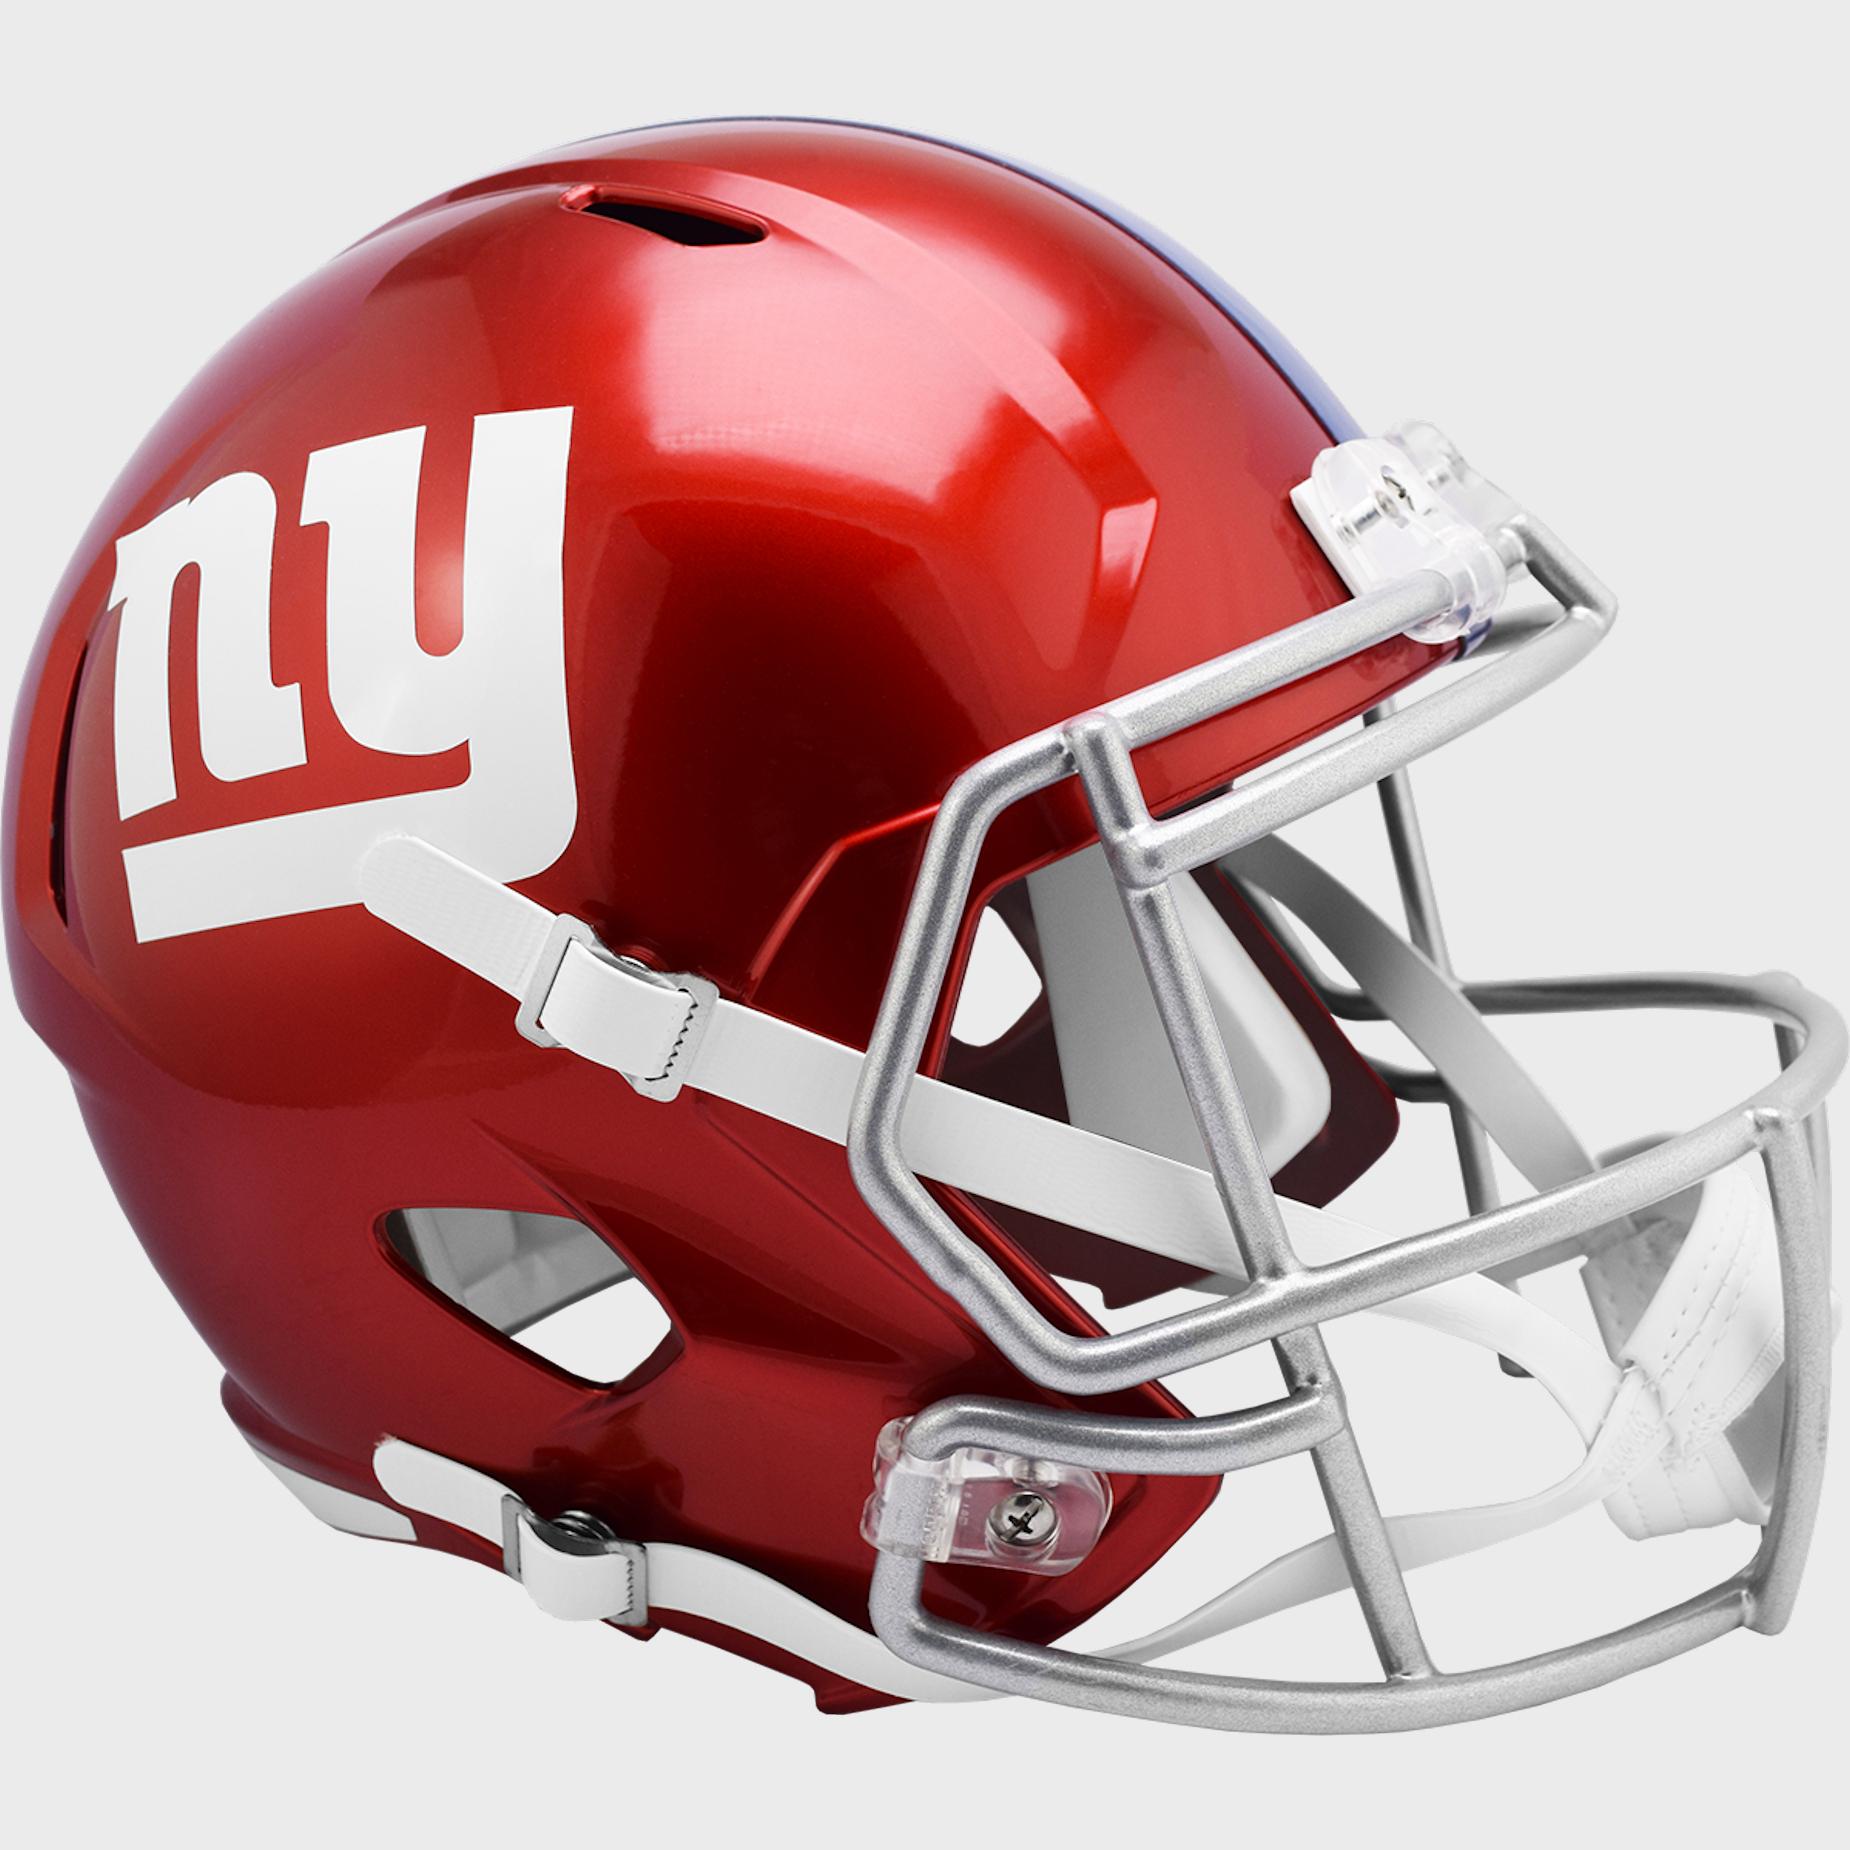 New York Giants Speed Replica Football Helmet <B>FLASH ESD 8/21/21</B>